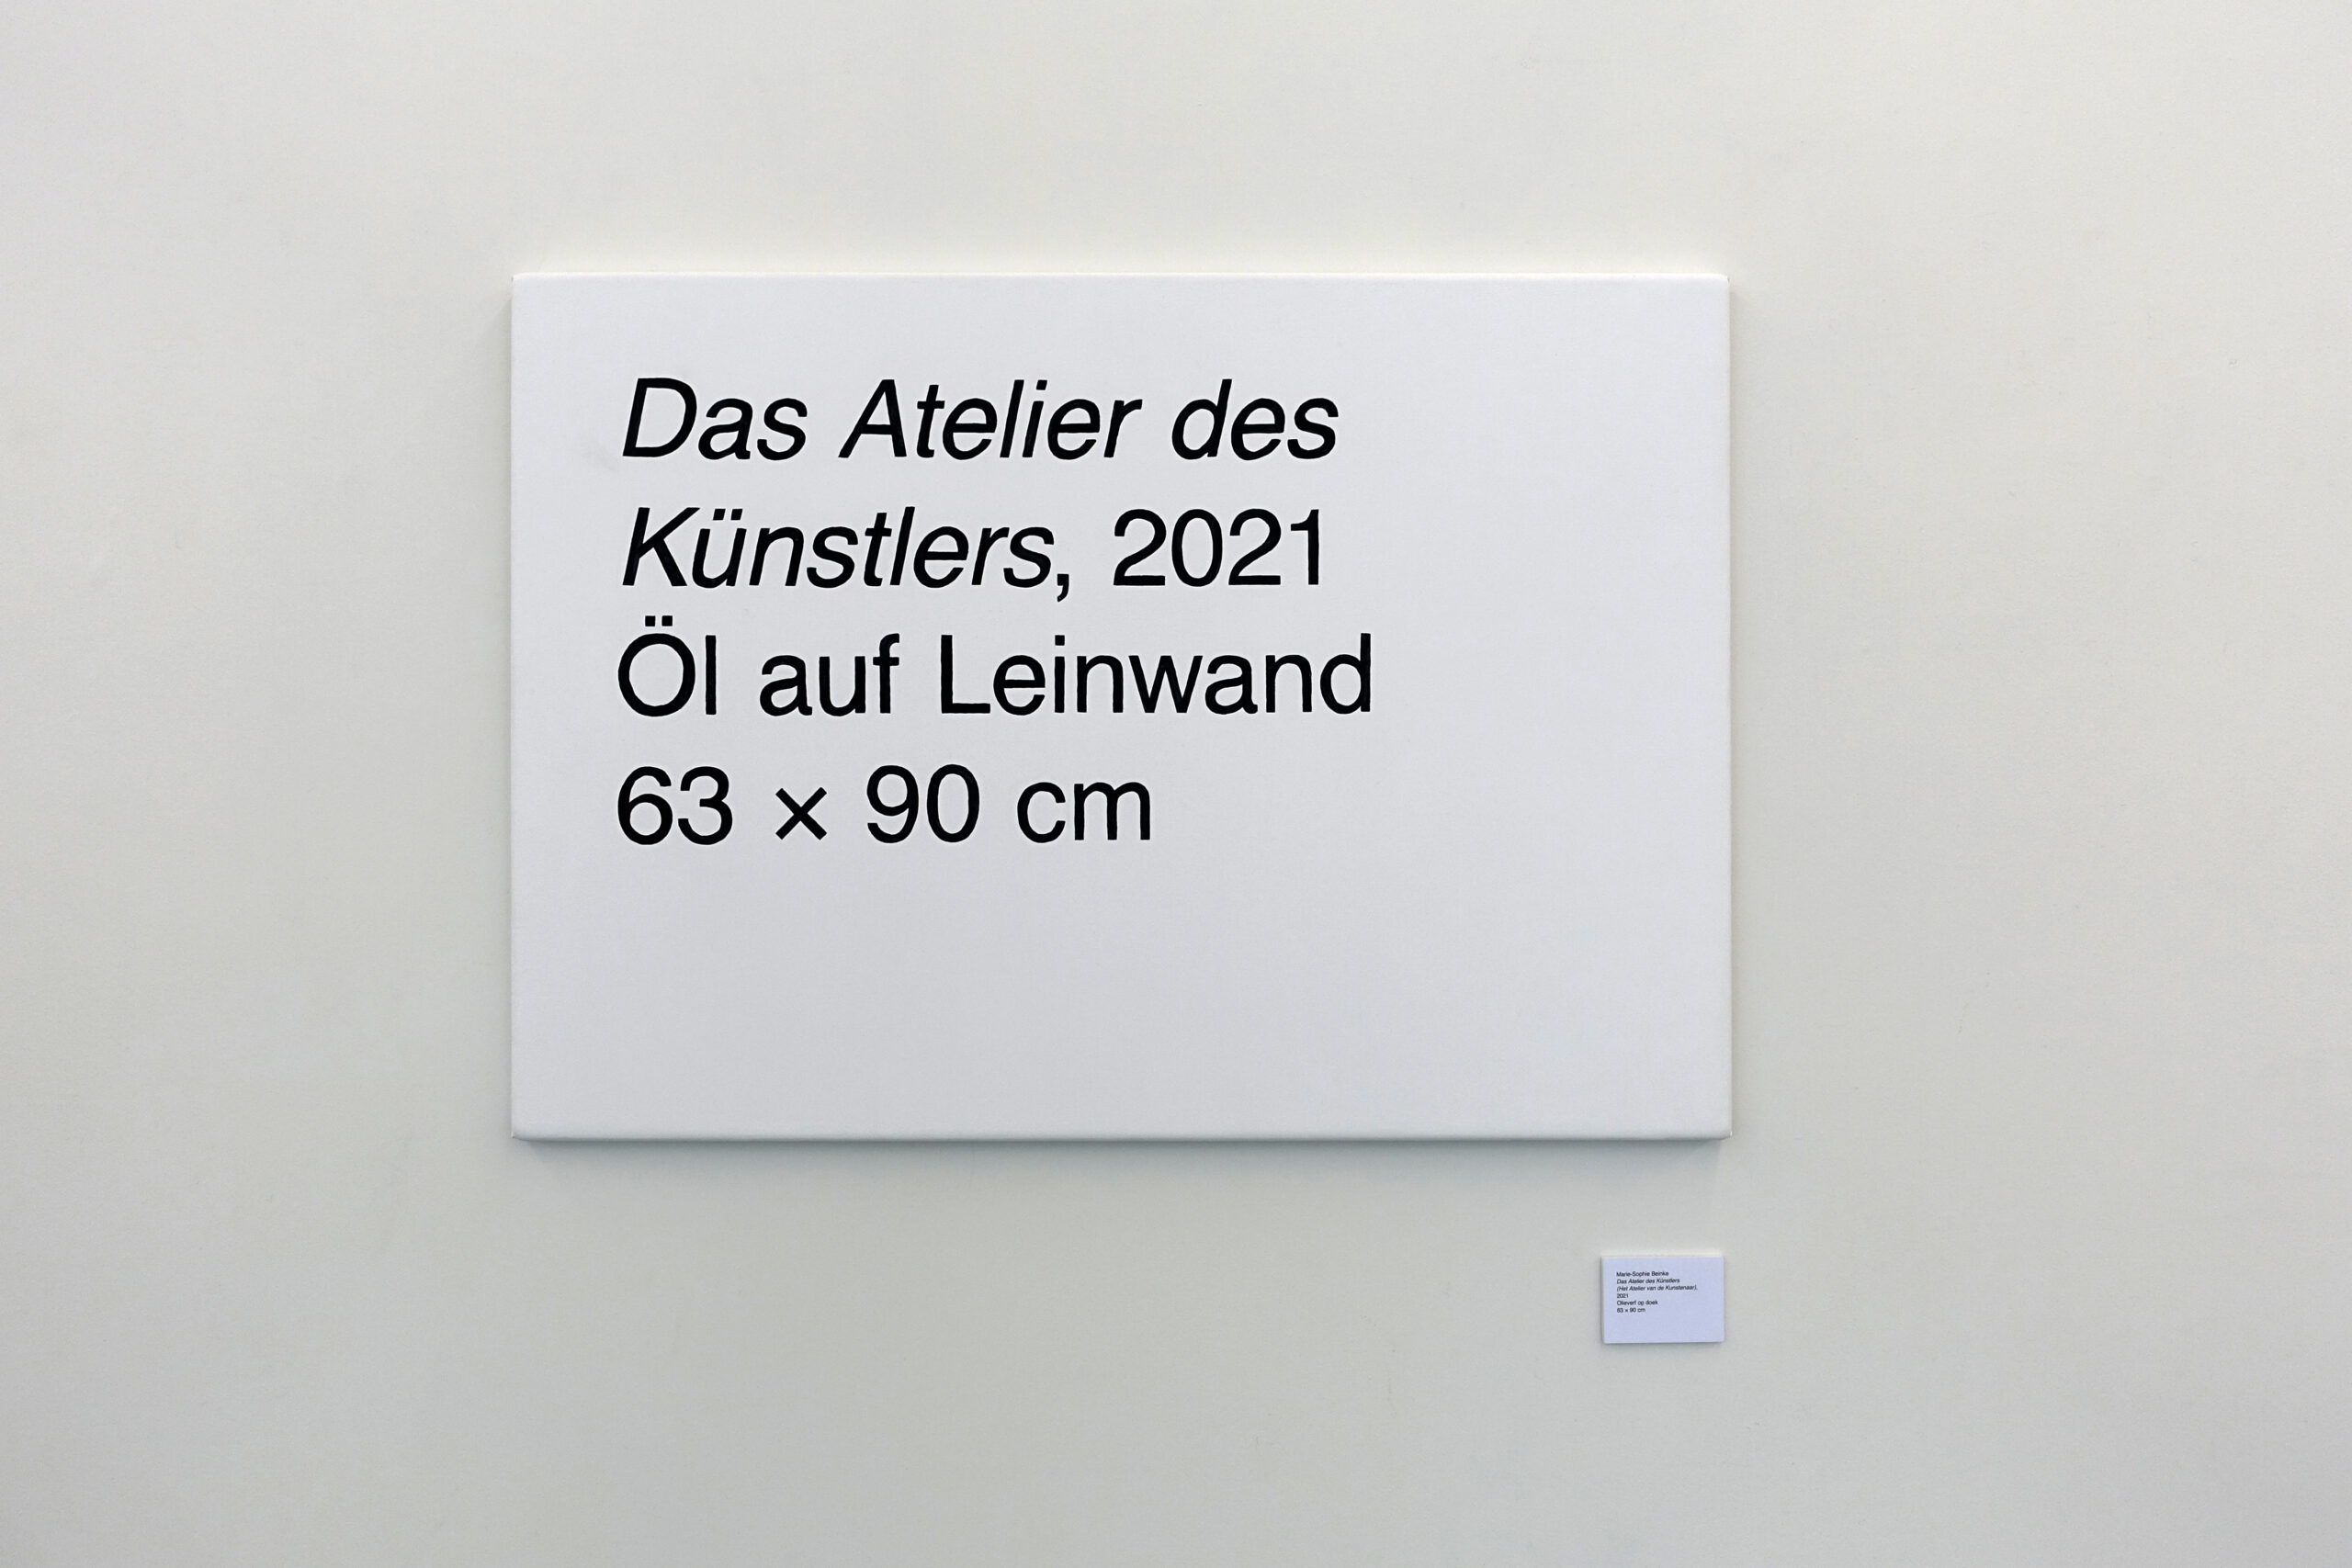 Marie-Sophie Beinke - Das Atelier des Künstlers (The Artist's Studio), 2021 Oil on canvas, digital print on paper and foam board 78.3 × 90 cm